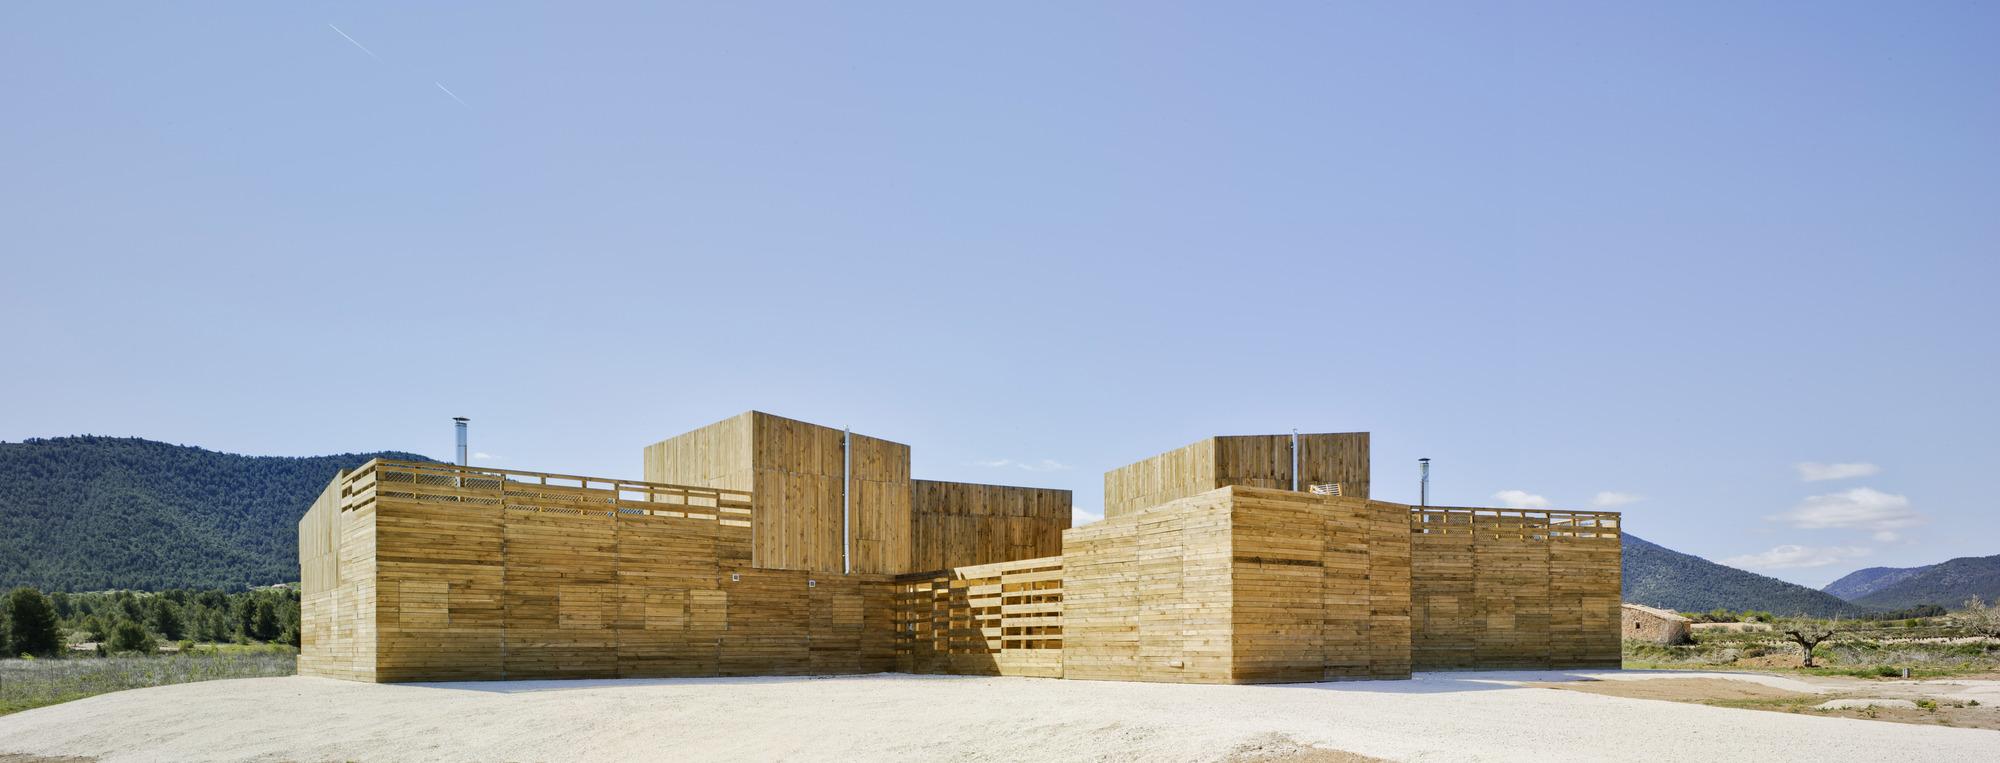 Casa Para Três Irmãs / Blancafort-Reus Arquitectura, © David Frutos